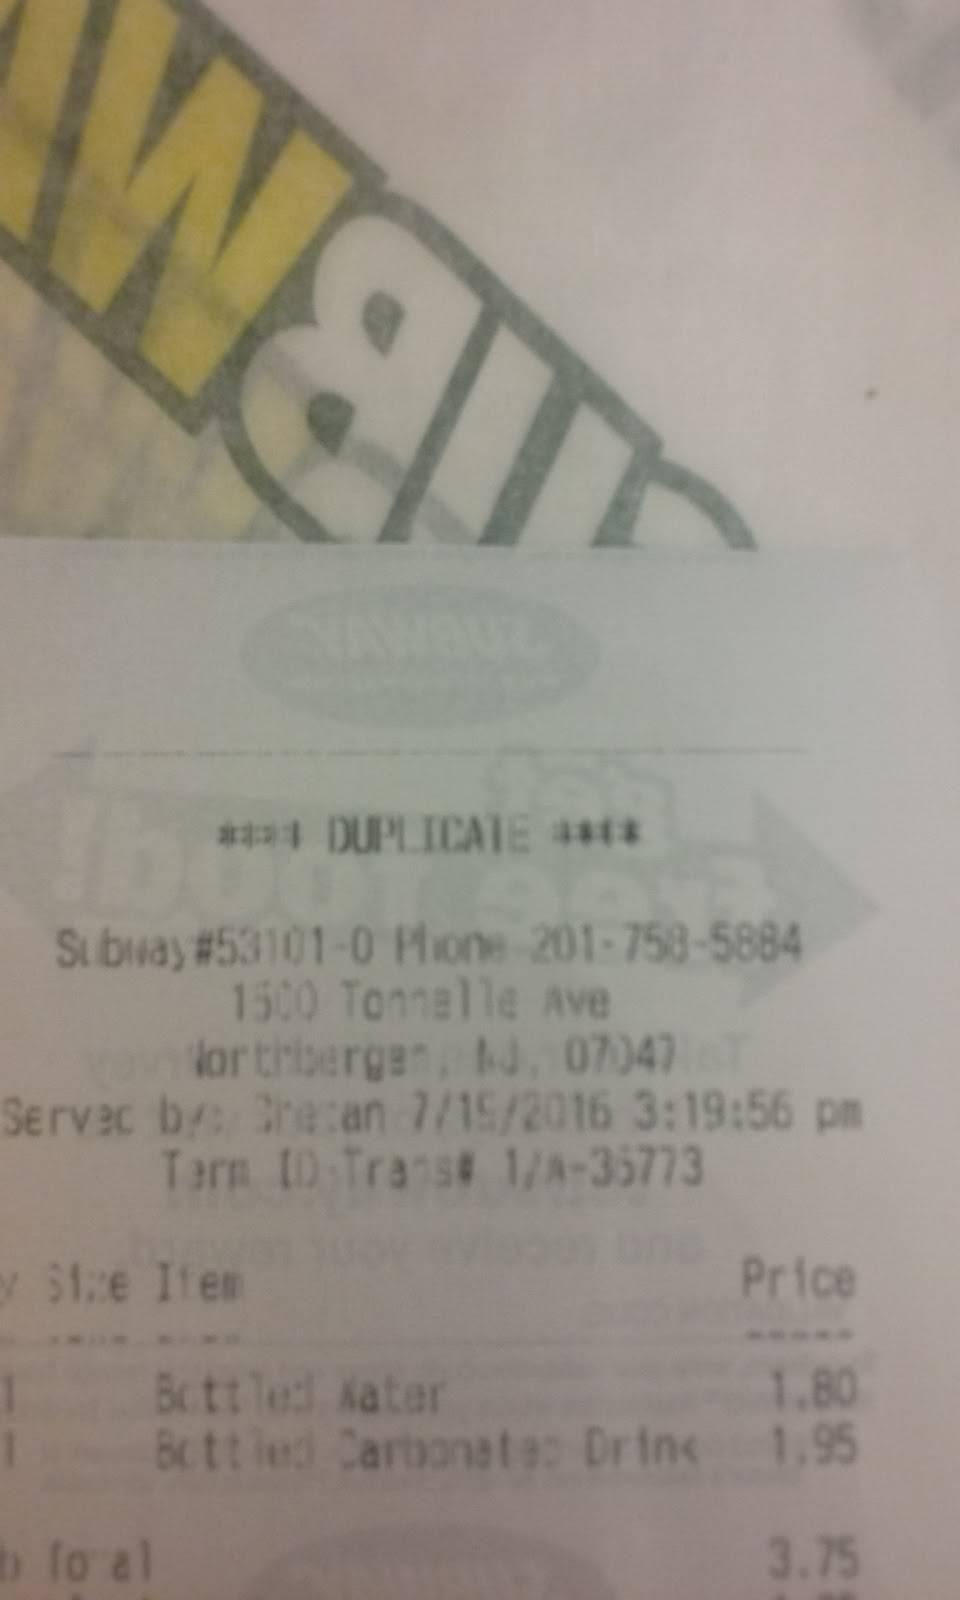 Subway Restaurants   restaurant   1600 Tonnelle Ave, North Bergen, NJ 07047, USA   2017585884 OR +1 201-758-5884